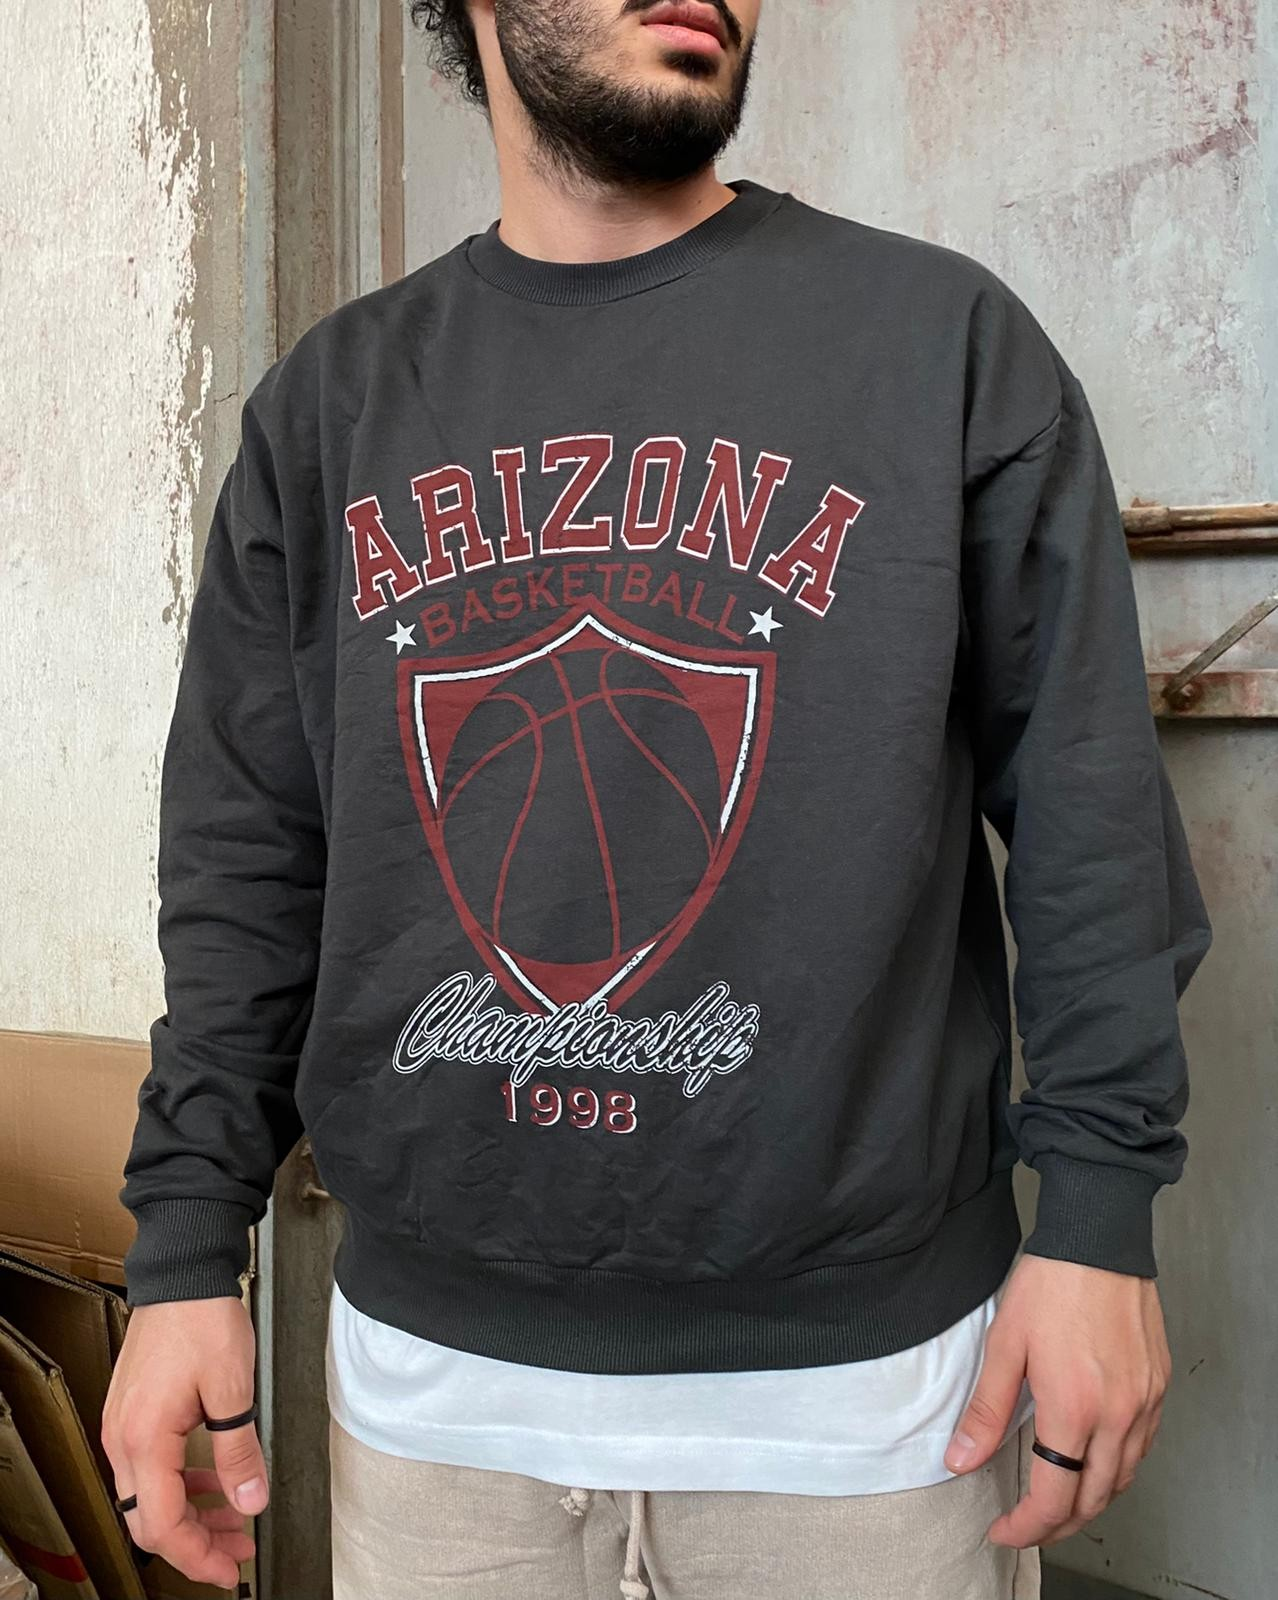 A.Design Arizona 1998 Sweatshirt (SAS59)